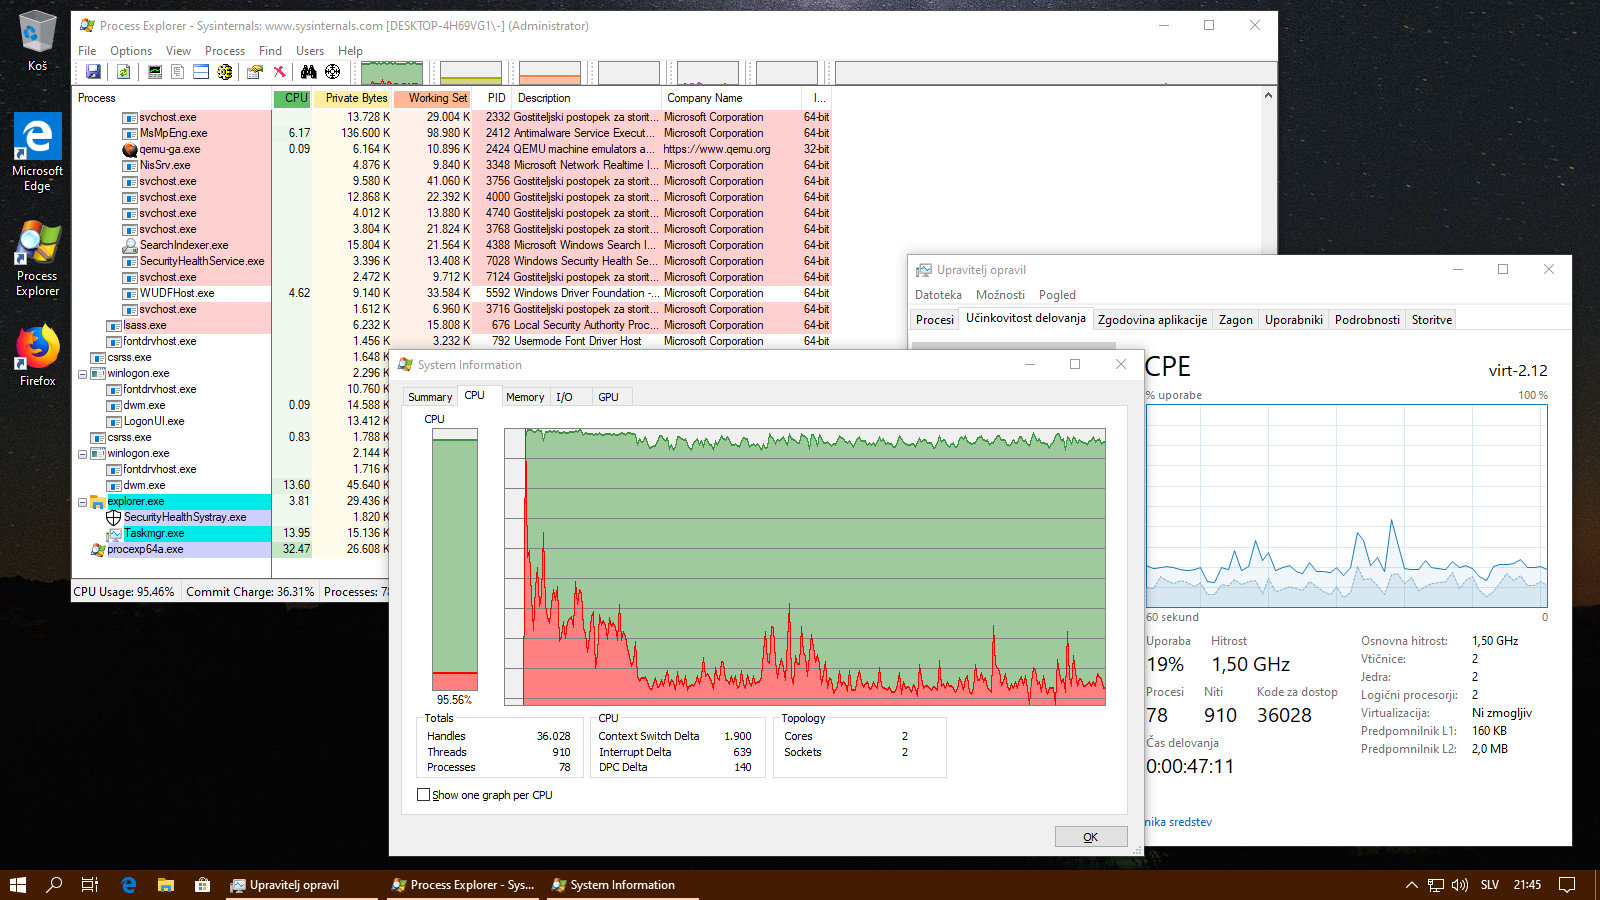 Screenshot - single graph